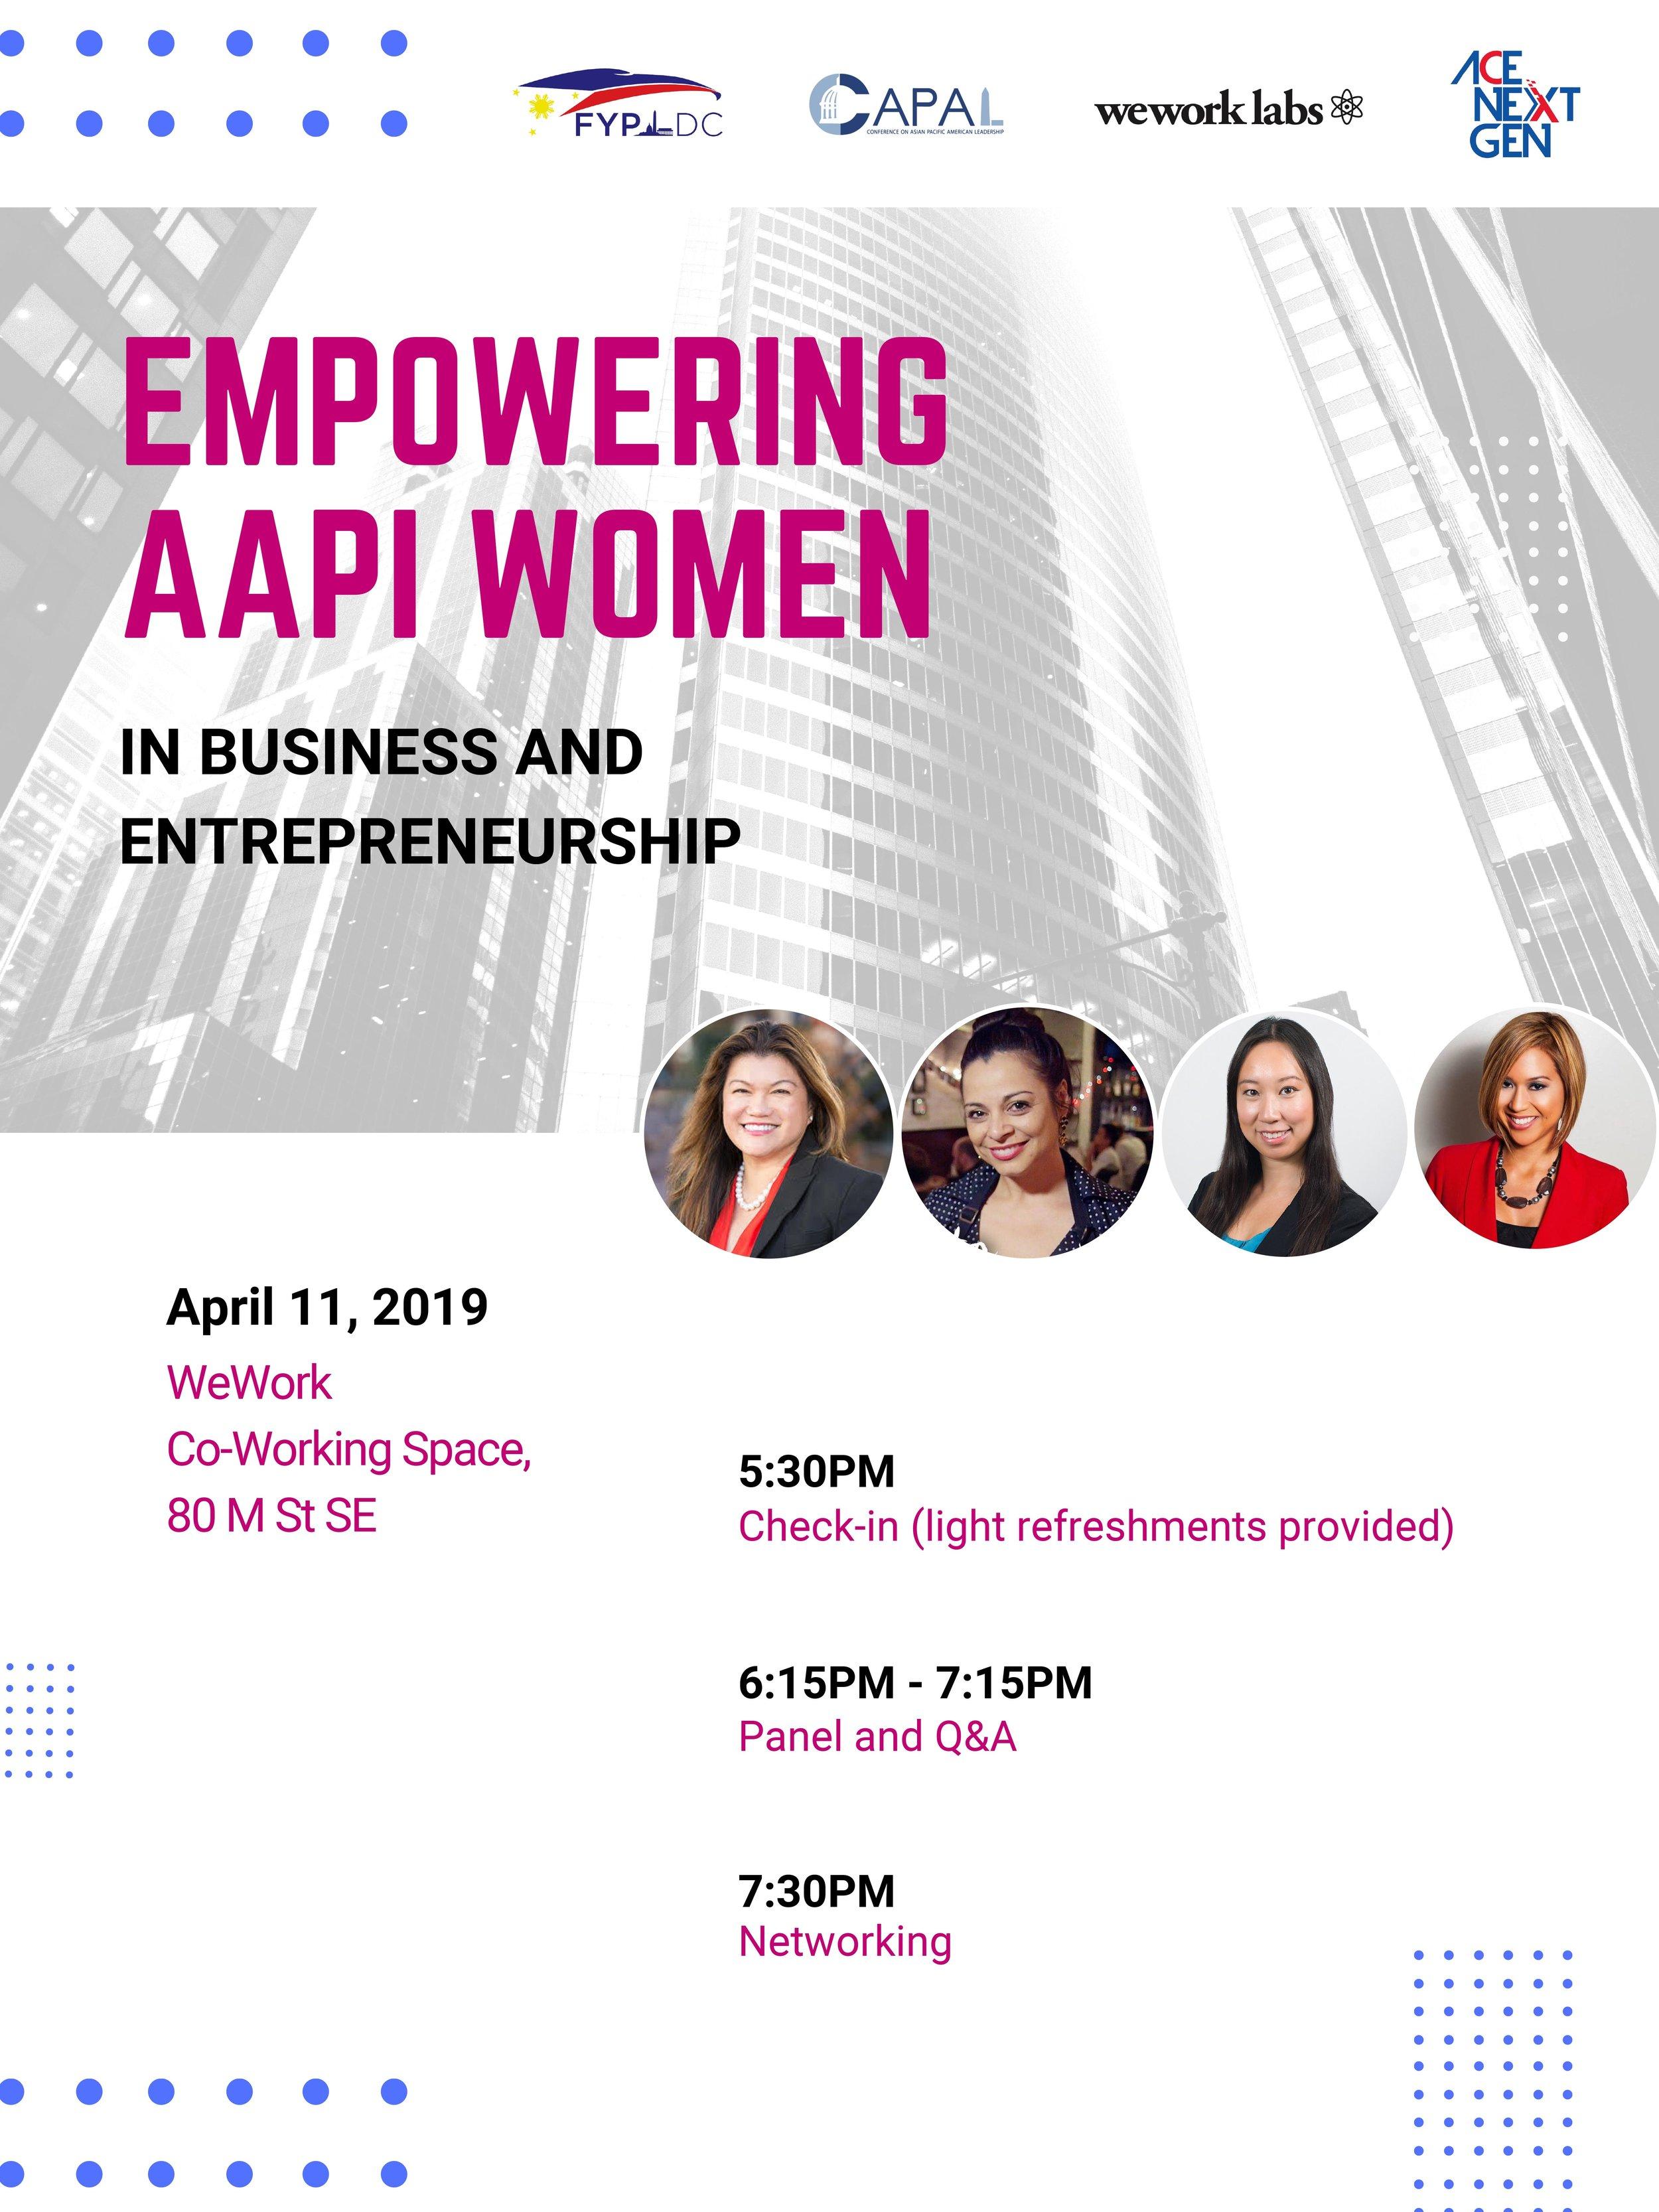 Empowering_Women_And_Minorities_in_Business_and_Entrepreneurship.jpg